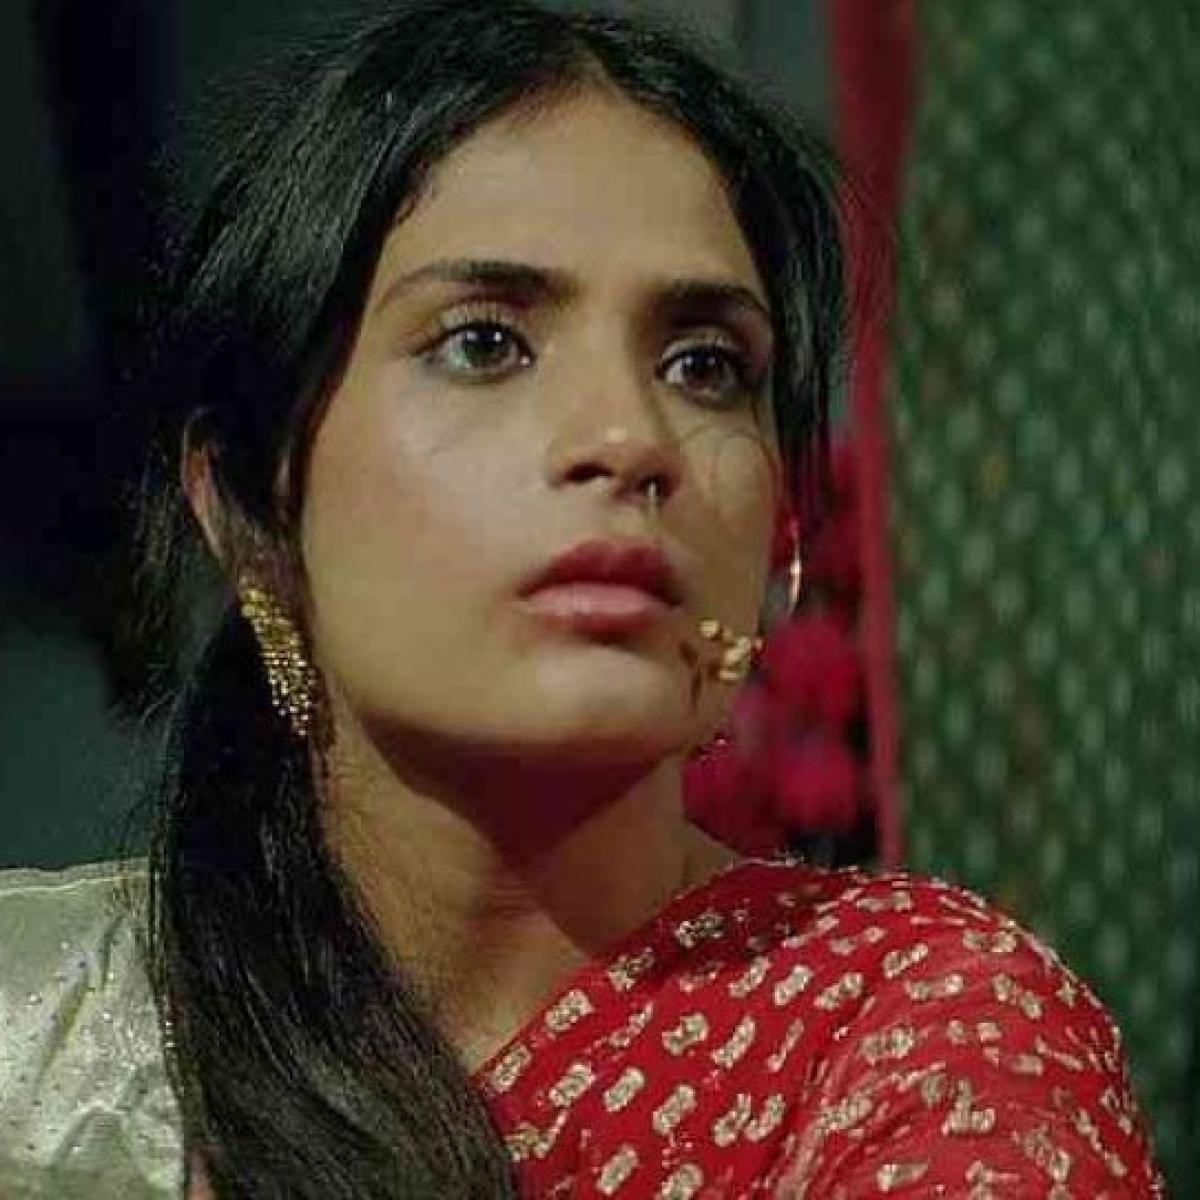 Richa Chadha Birthday Special: From 'Gangs of Wasseypur' to 'Fukrey' - movies to binge-watch